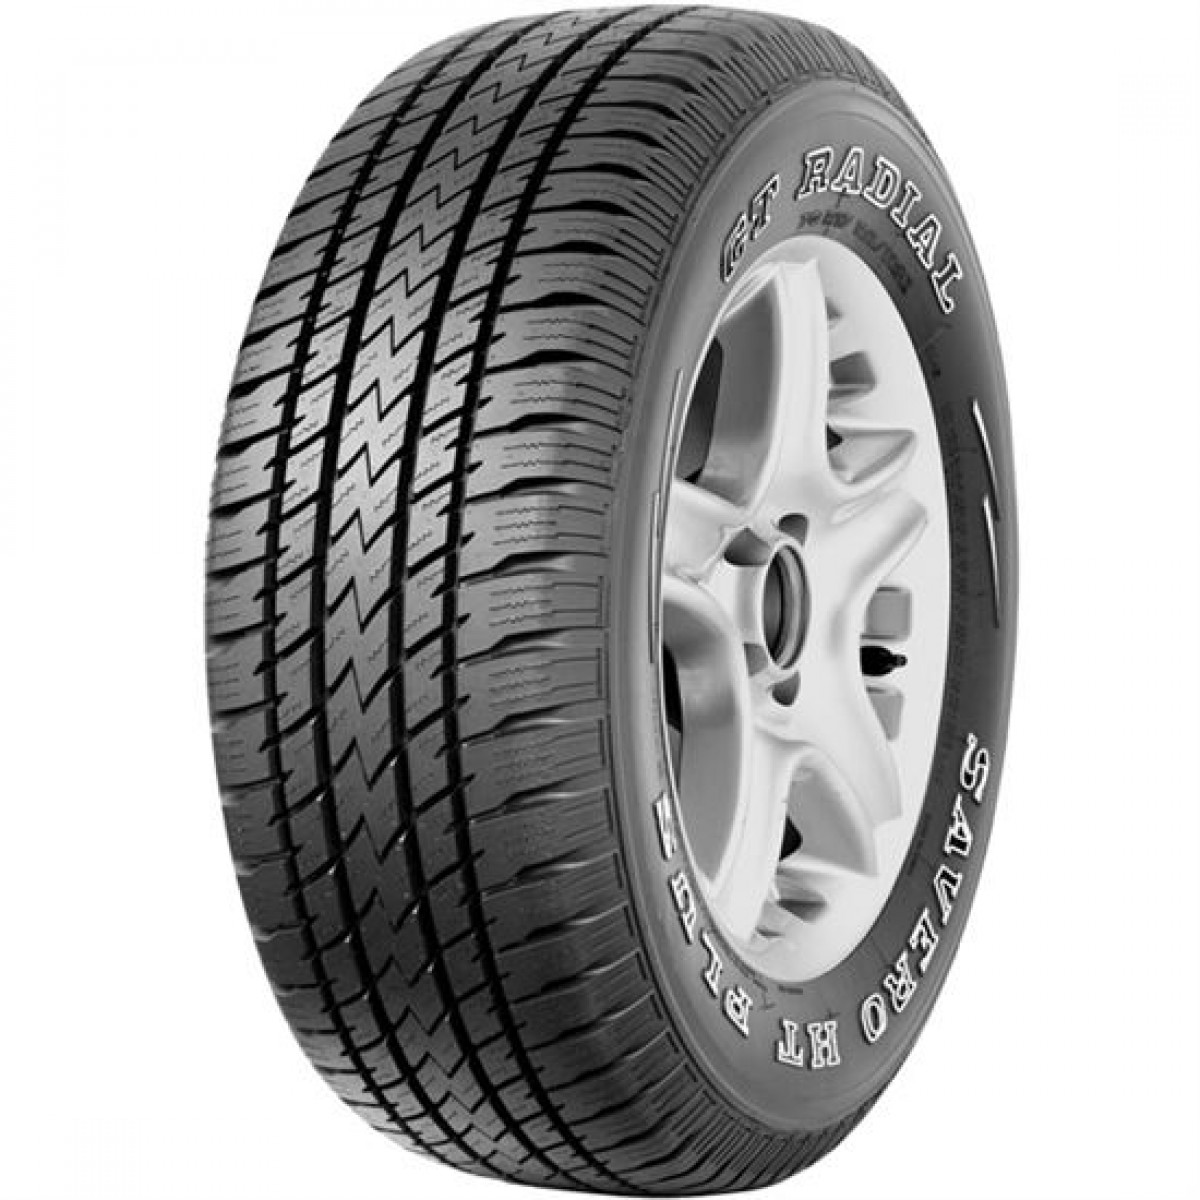 Pneu 245/70R16 GT Radial Savero Ht2 (Ranger, S10, Amarok, Sportage)